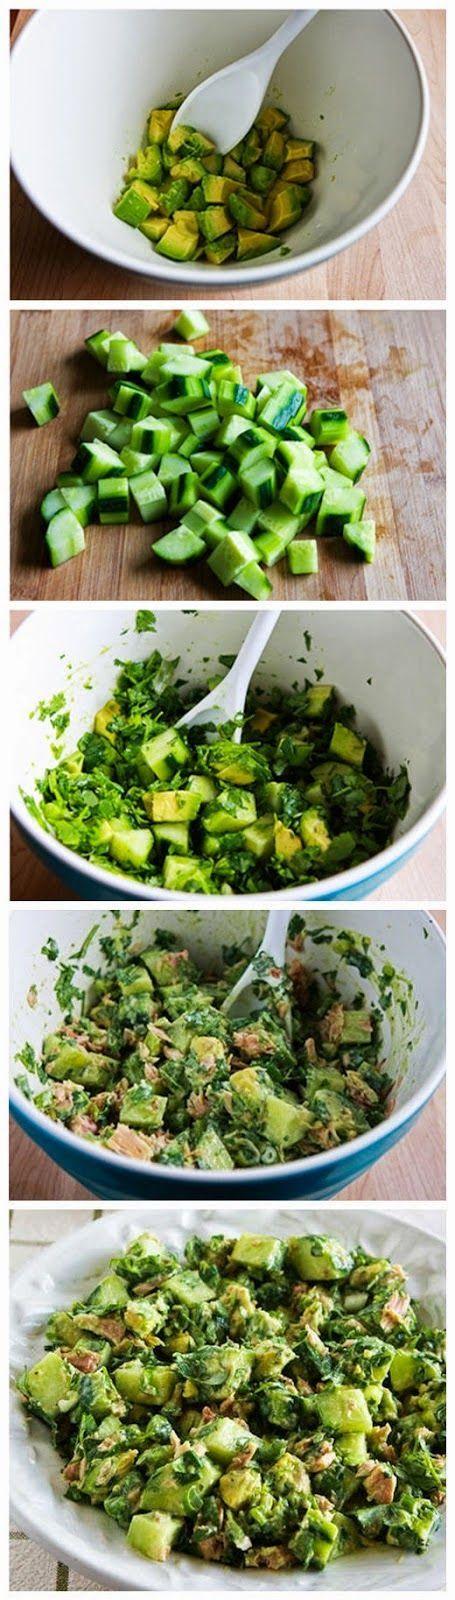 Choose-Diy: Cucumber Avocado Salad with Tuna, Cilantro, and Lime